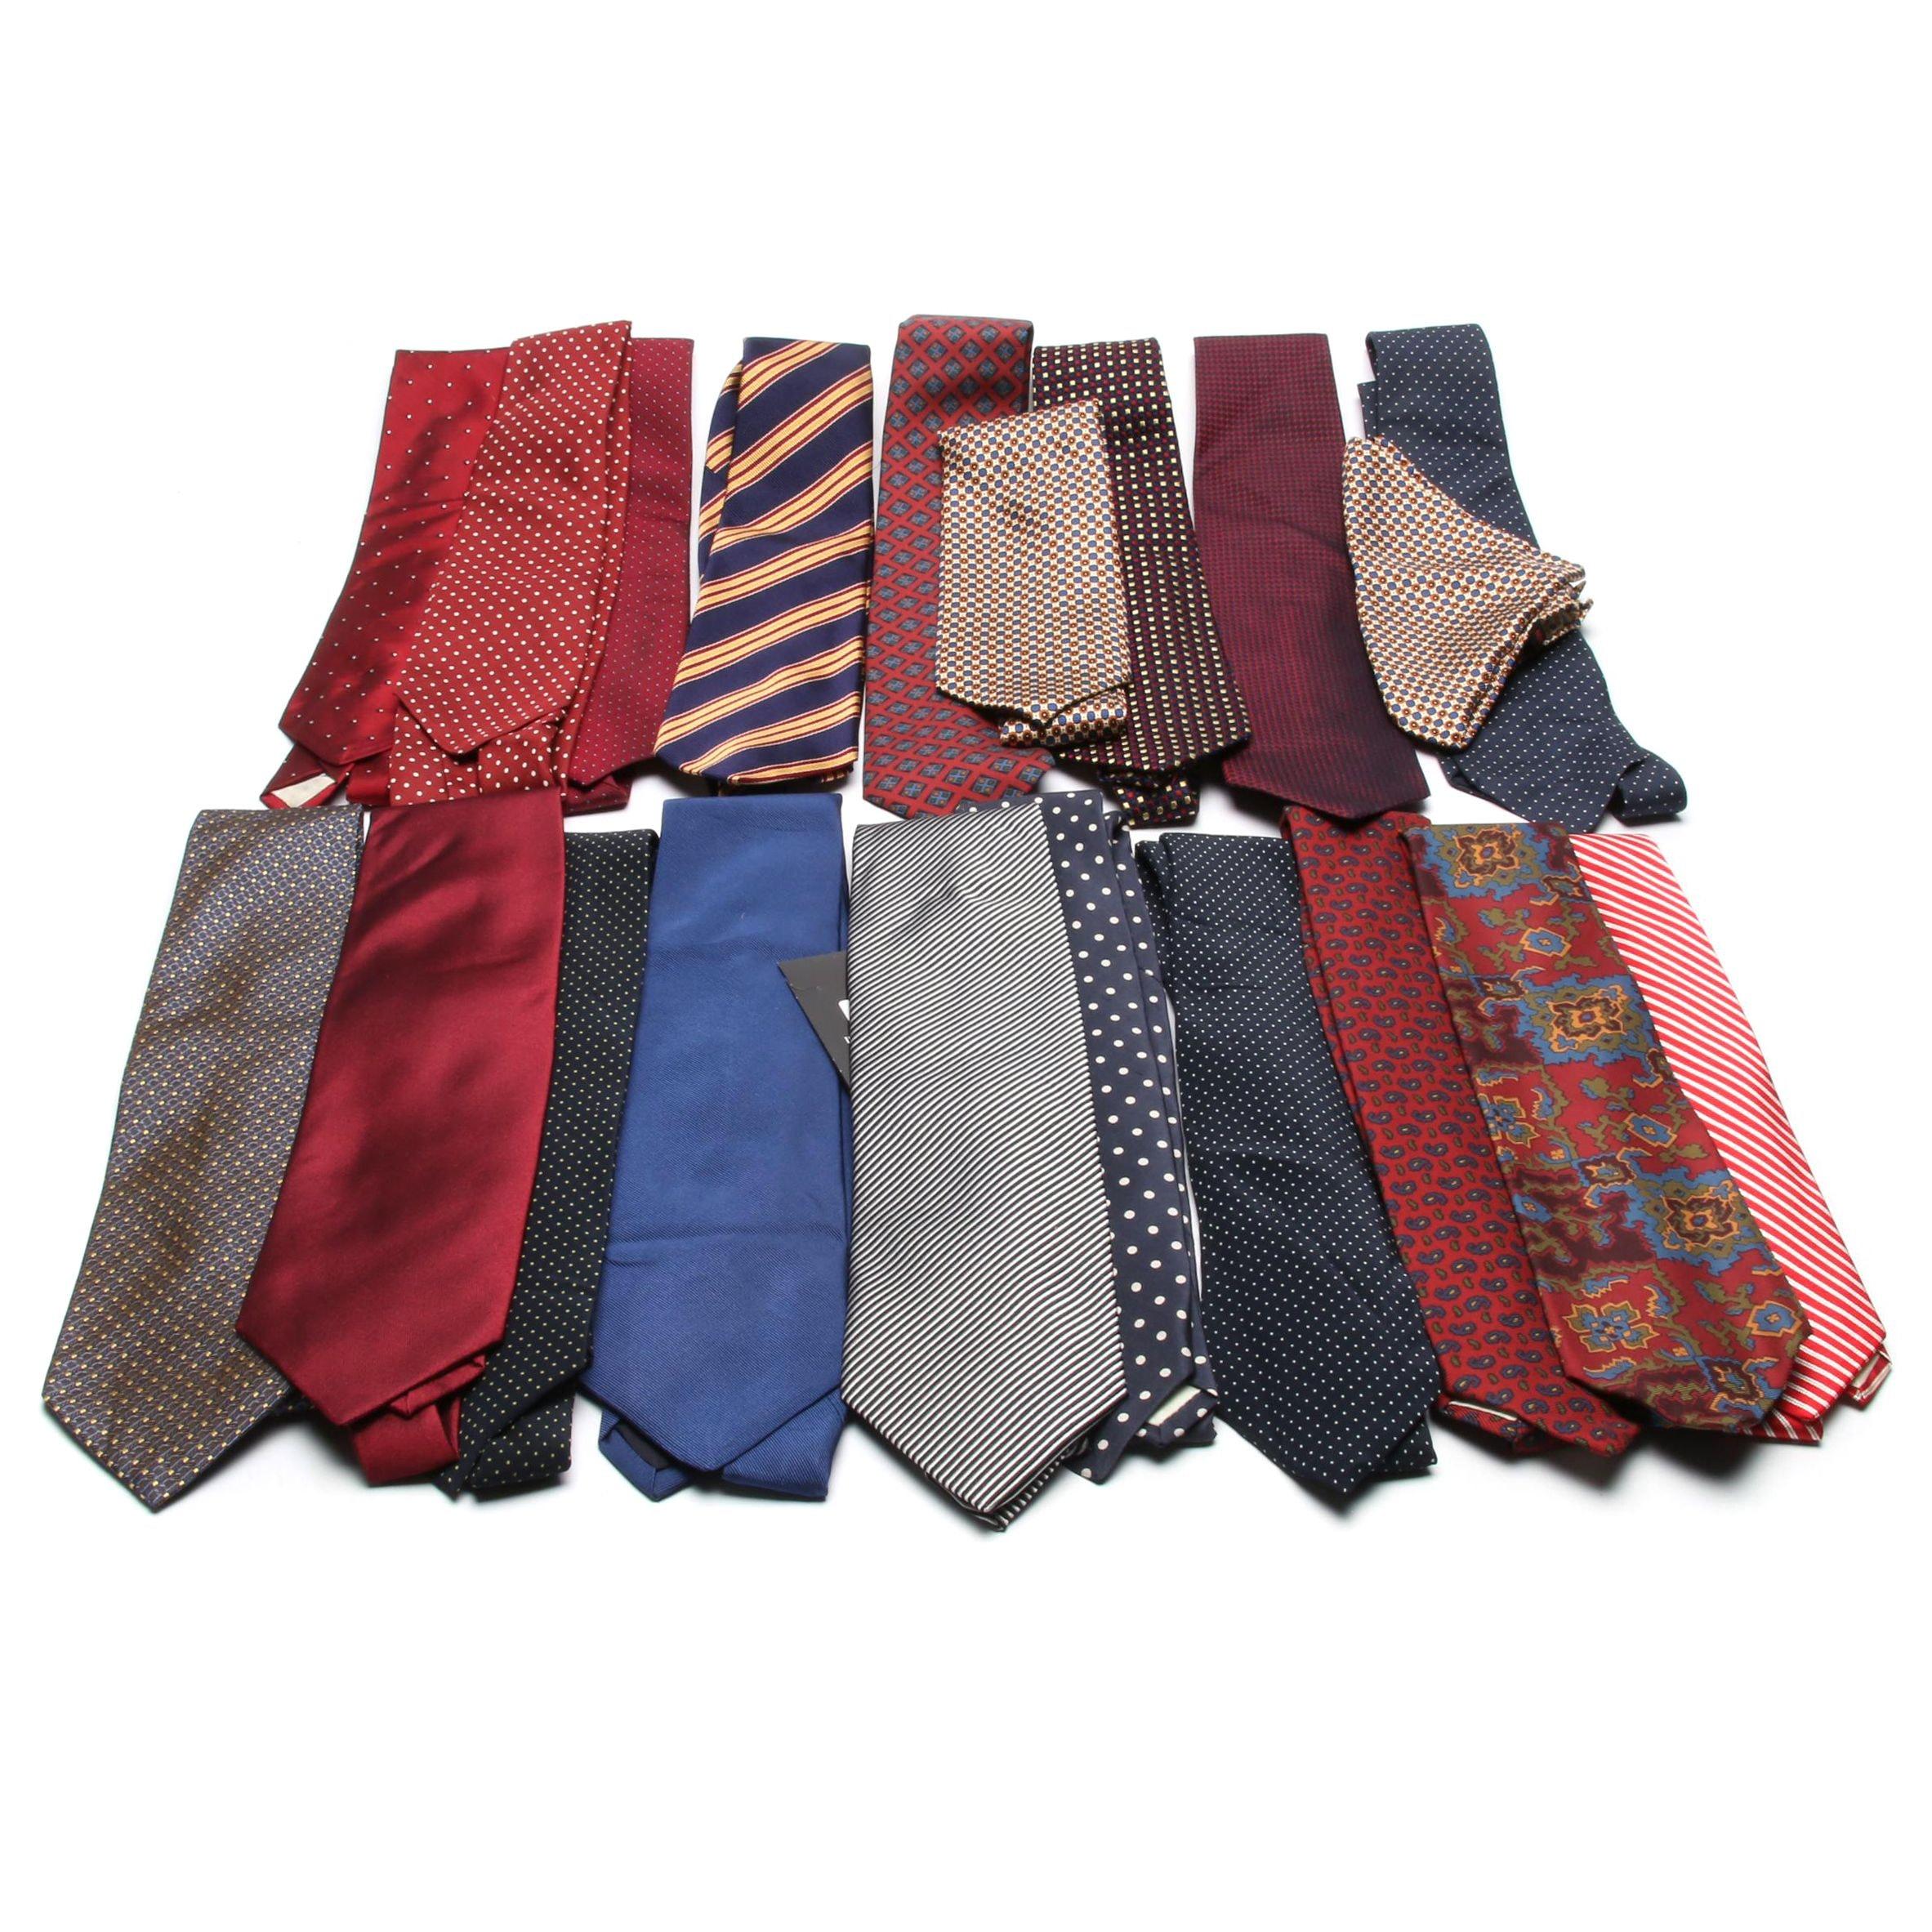 Men's Giorgio Armani, Paul Stuart, Brooks Brothers, Loro Piana Silk Neckties